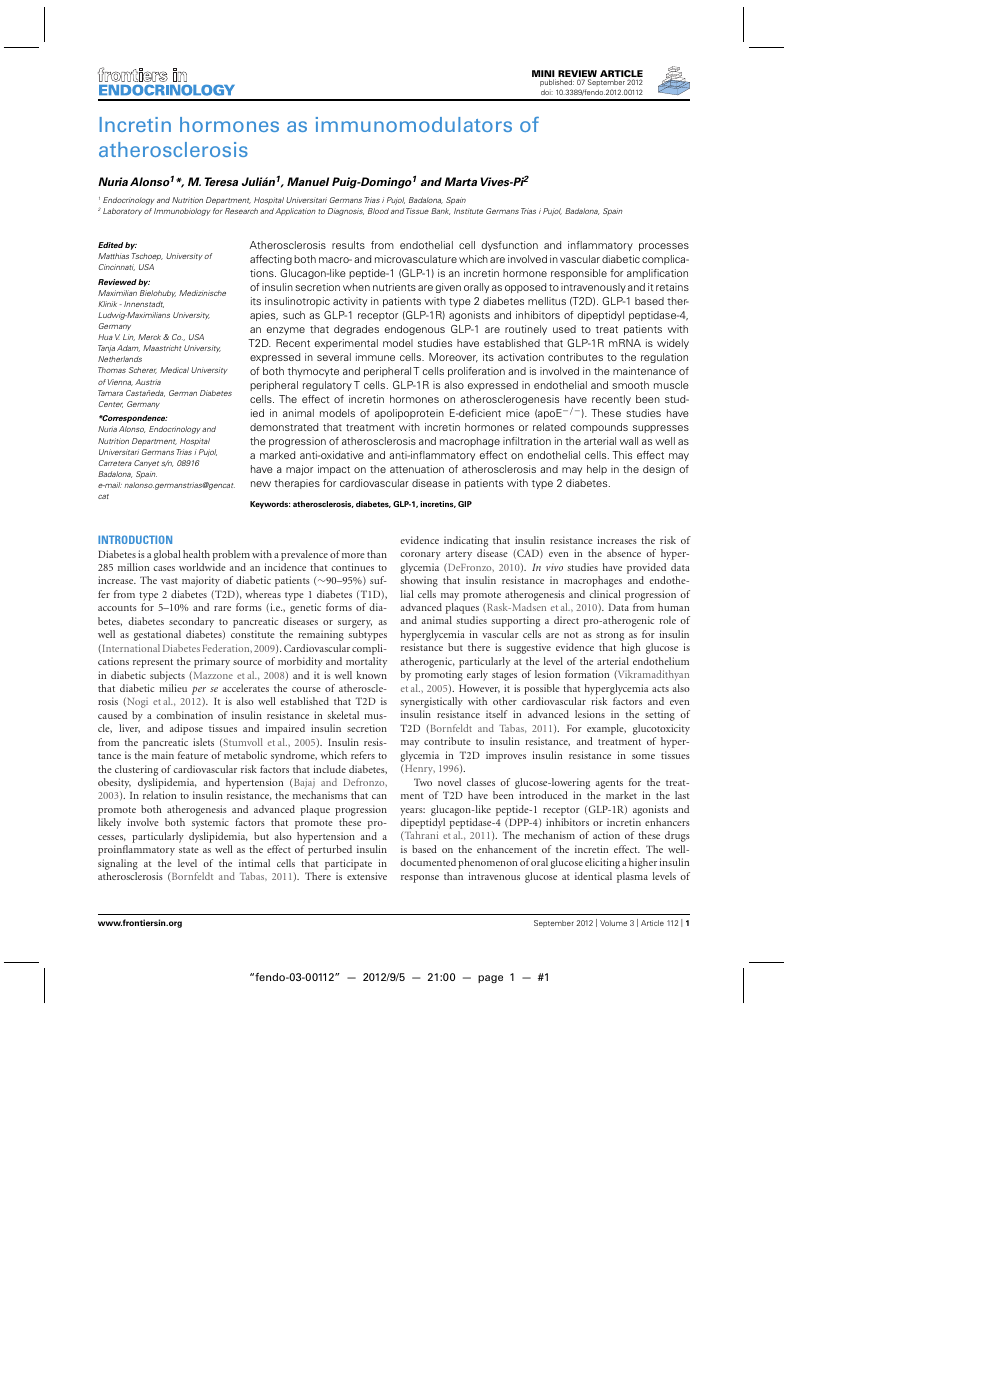 Incretin hormones as immunomodulators of atherosclerosis